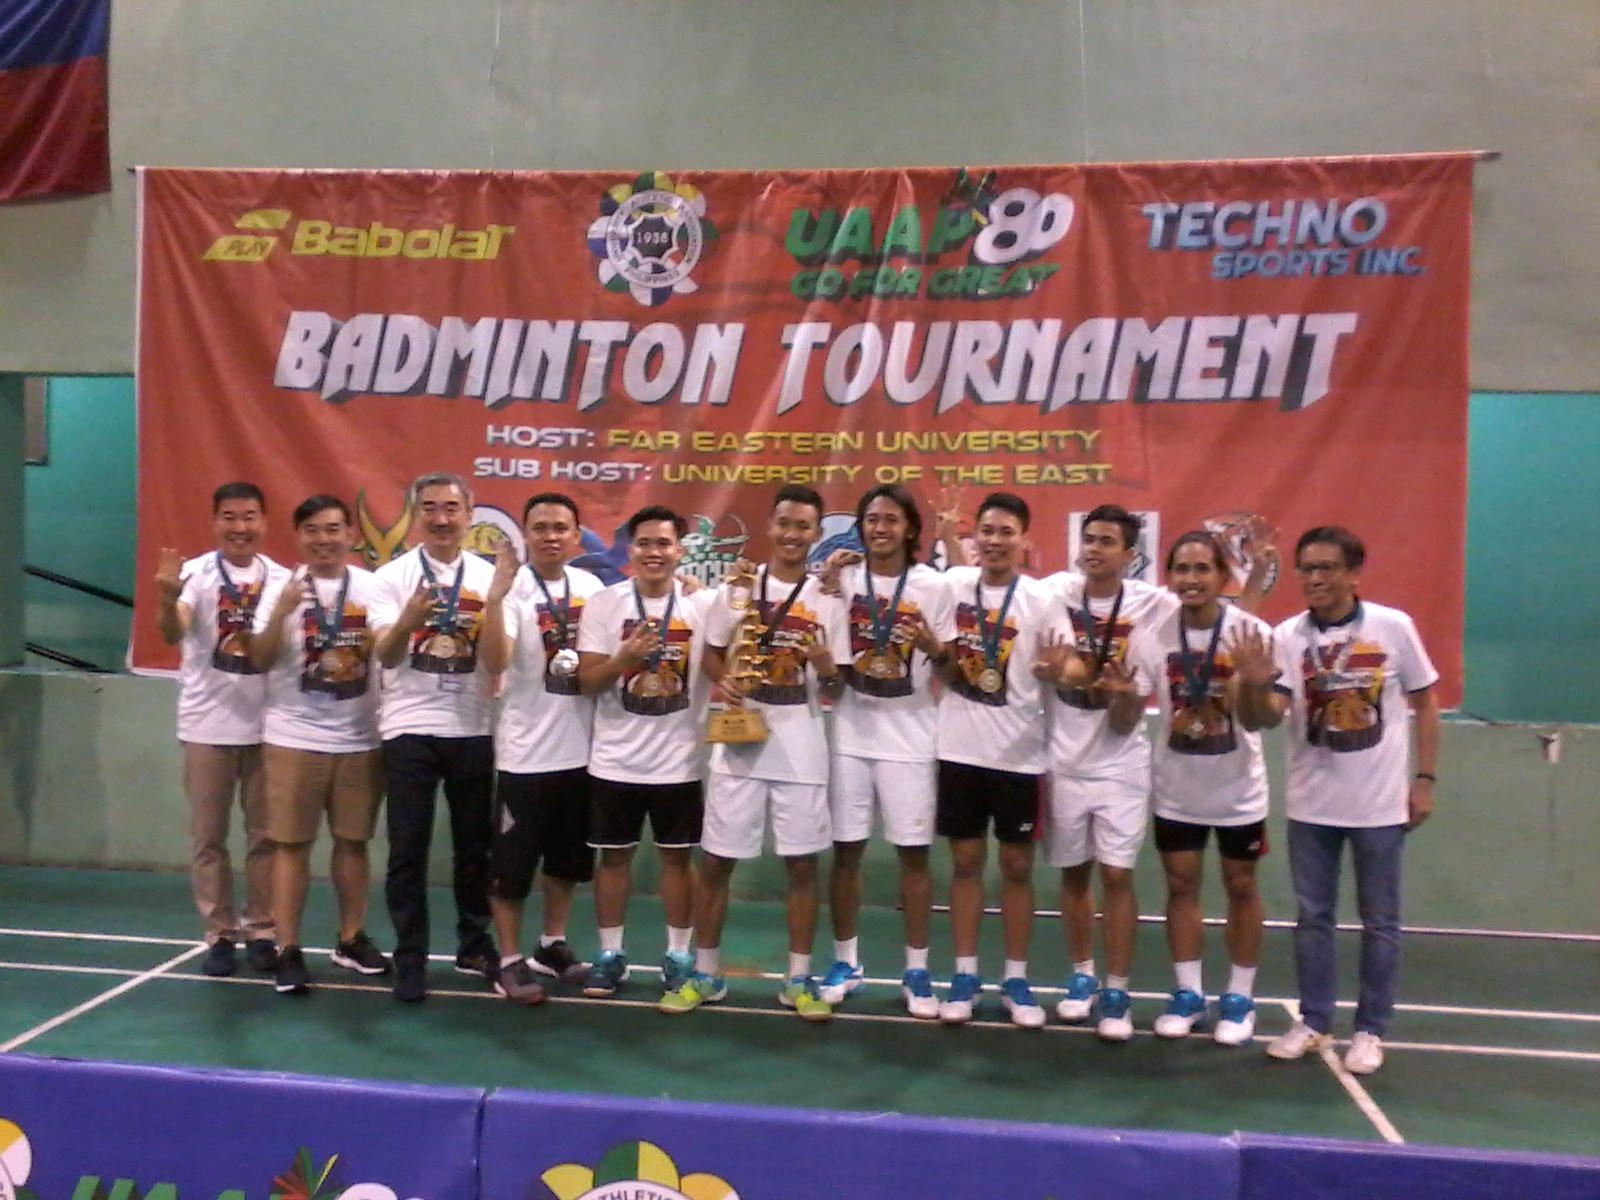 Bulldogs complete badminton 4-peat